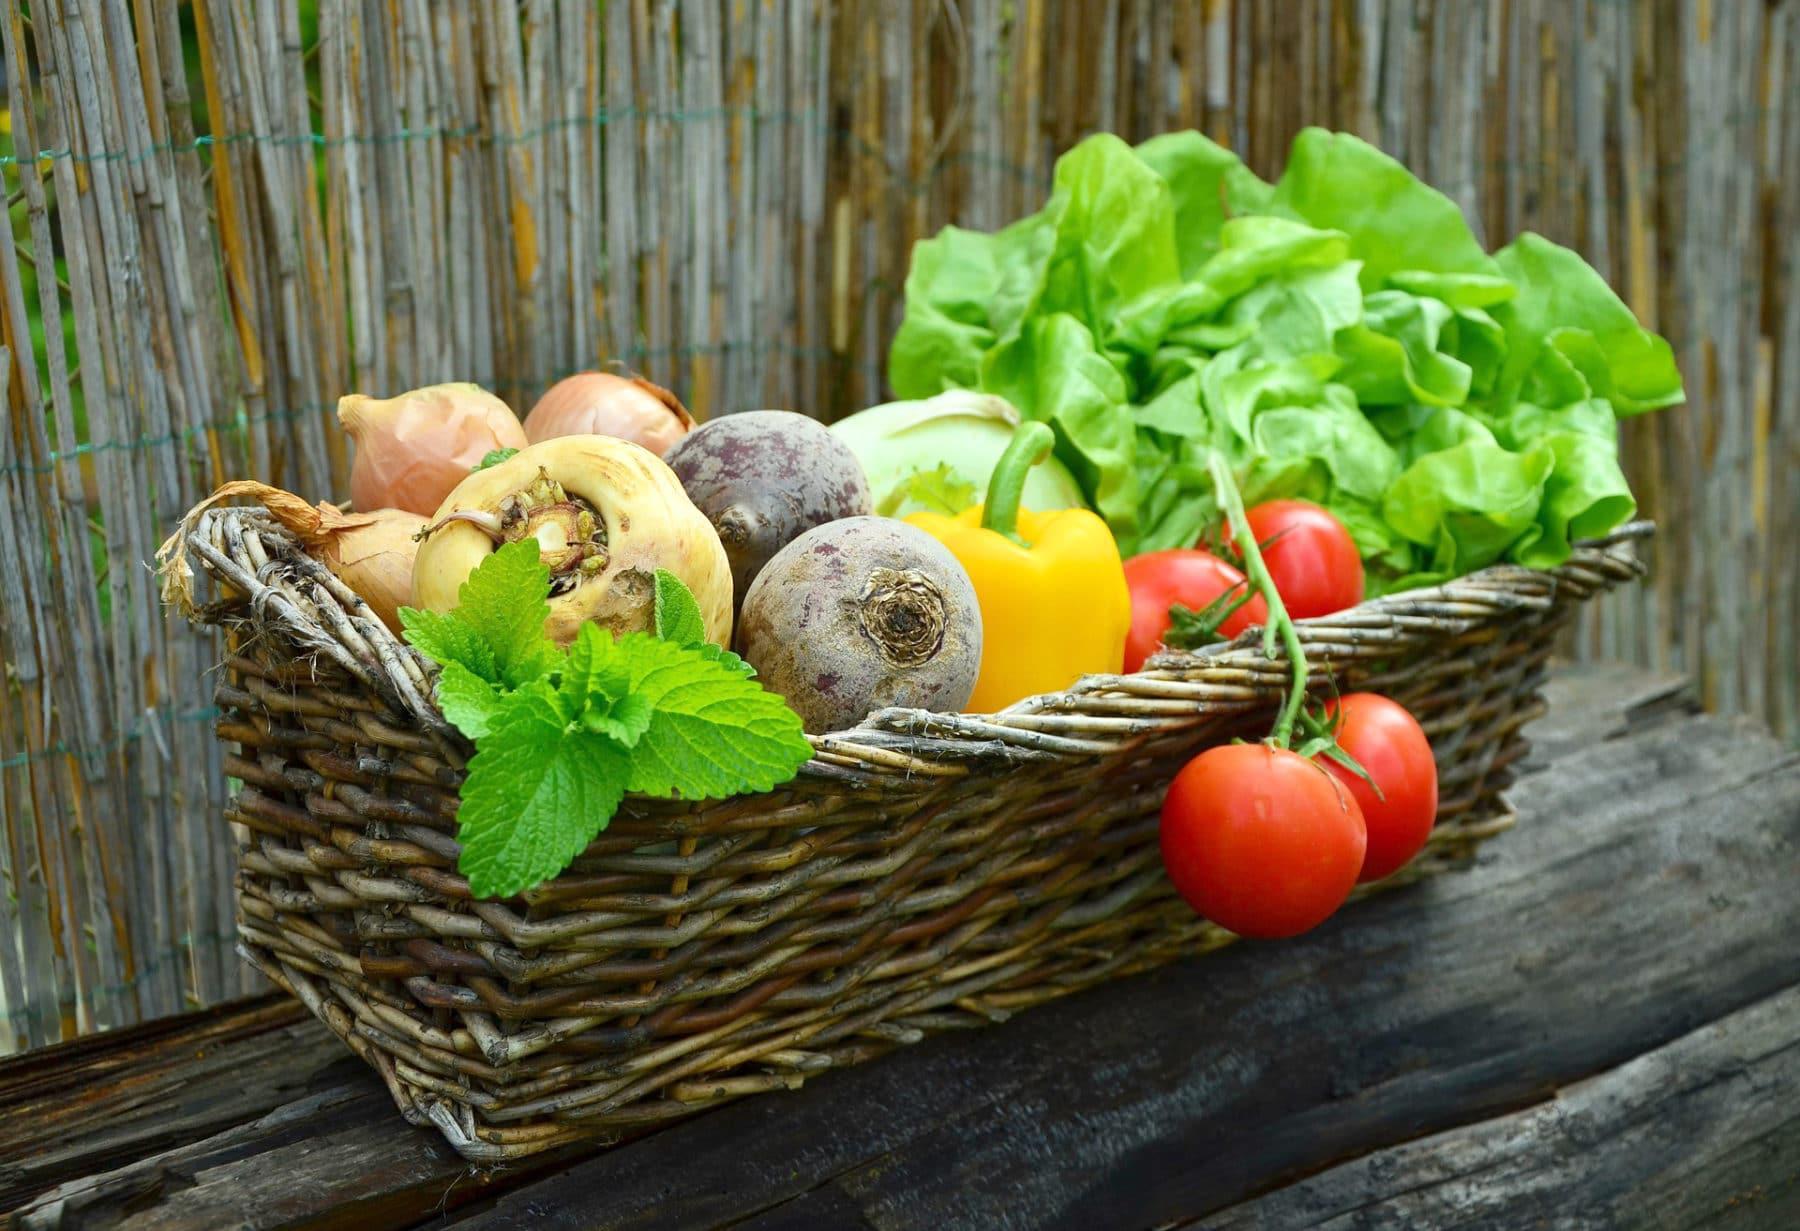 ein Korb voller gesundem Gemüse